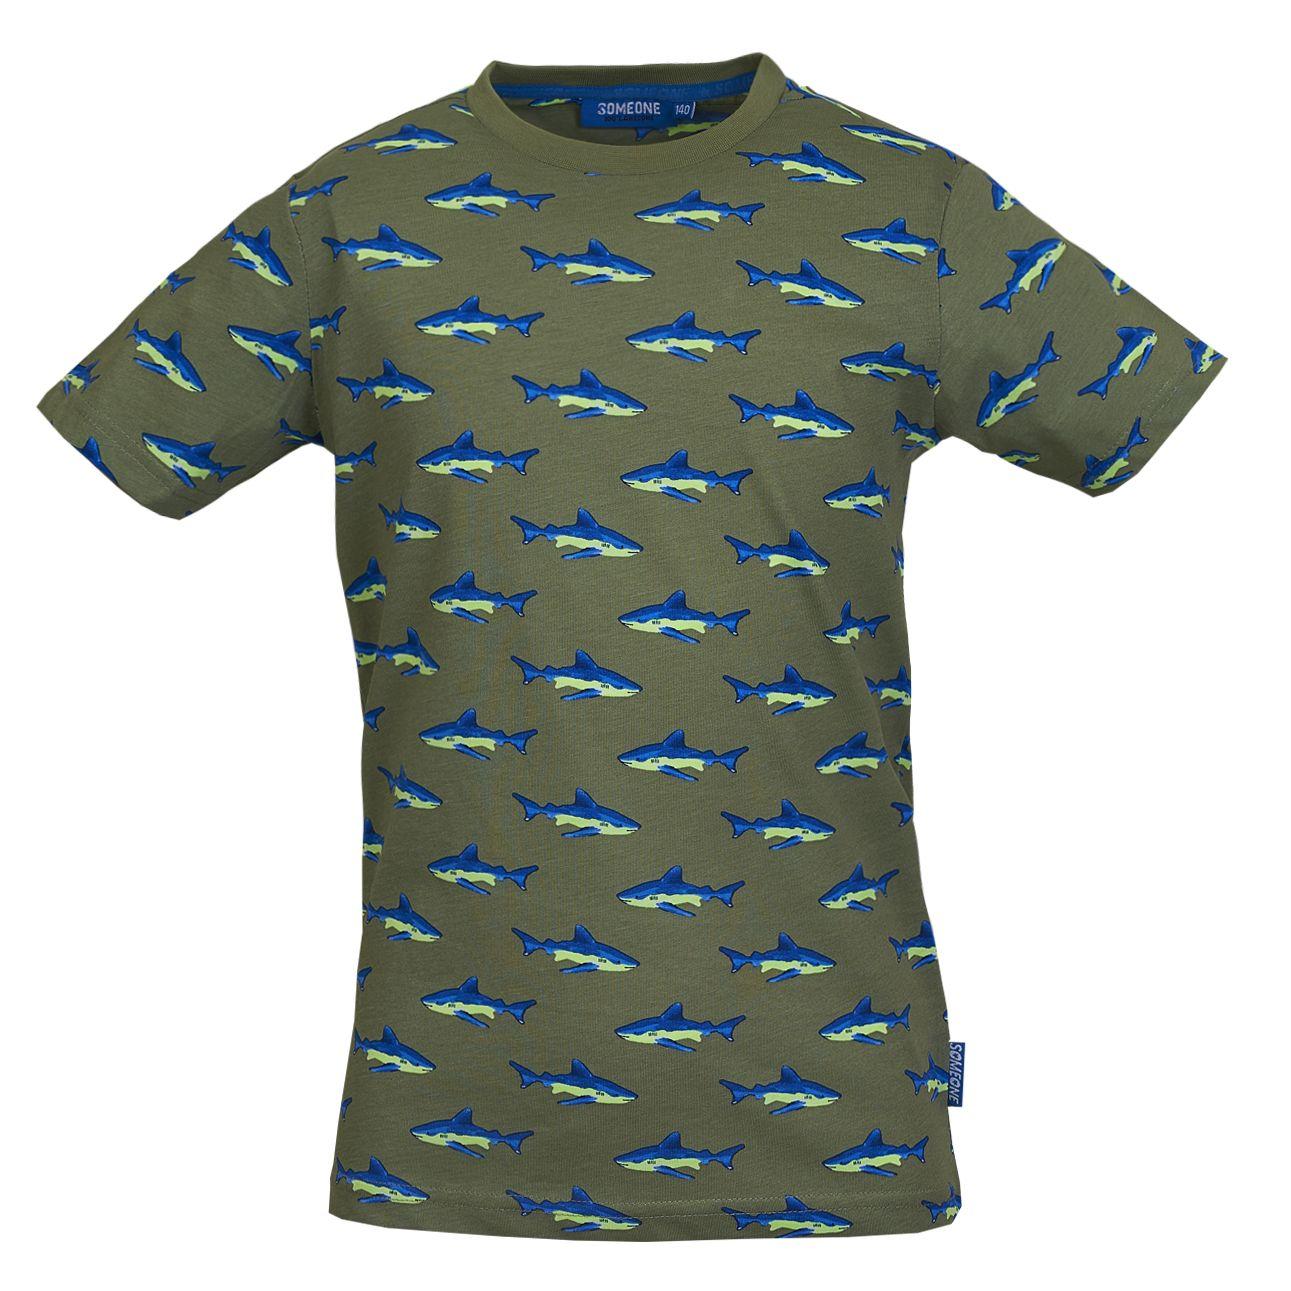 T-Shirt Haie 092 Khaki SOMEONE 100% Awesome